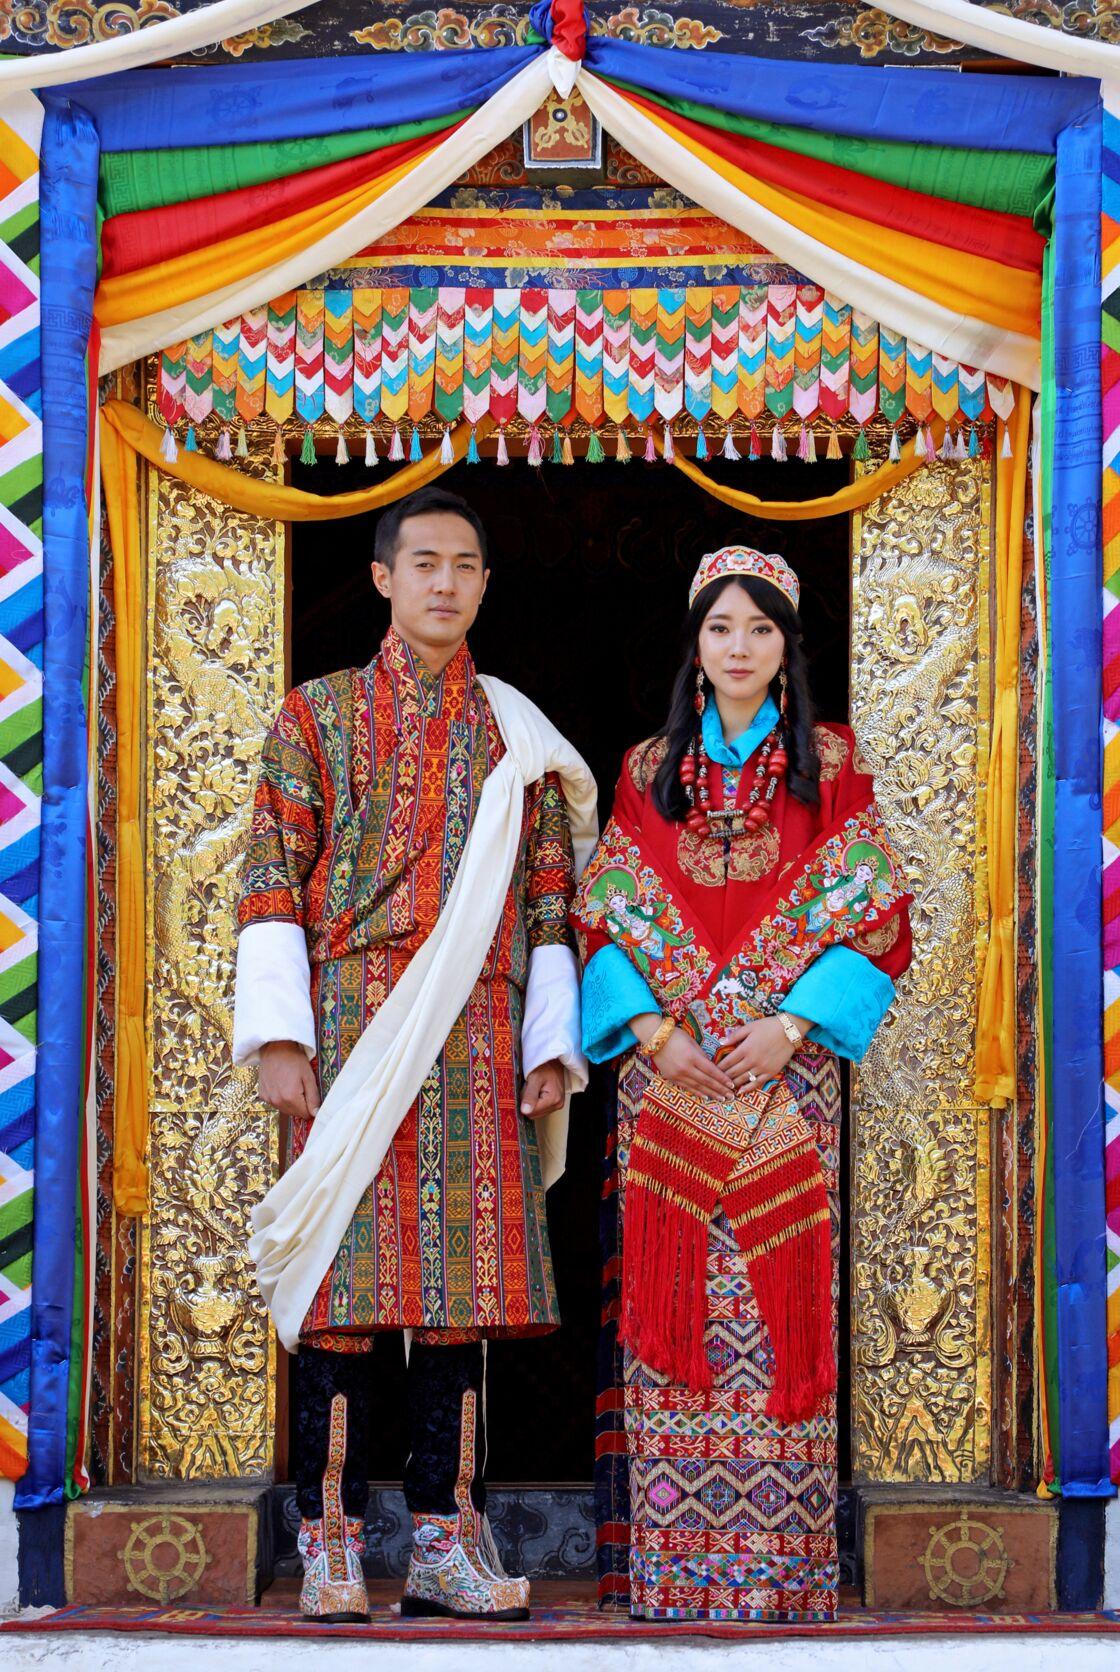 Mariage de la princesse Eeuphelma Choden Wangchuck et Dasho Thinlay Norbu.